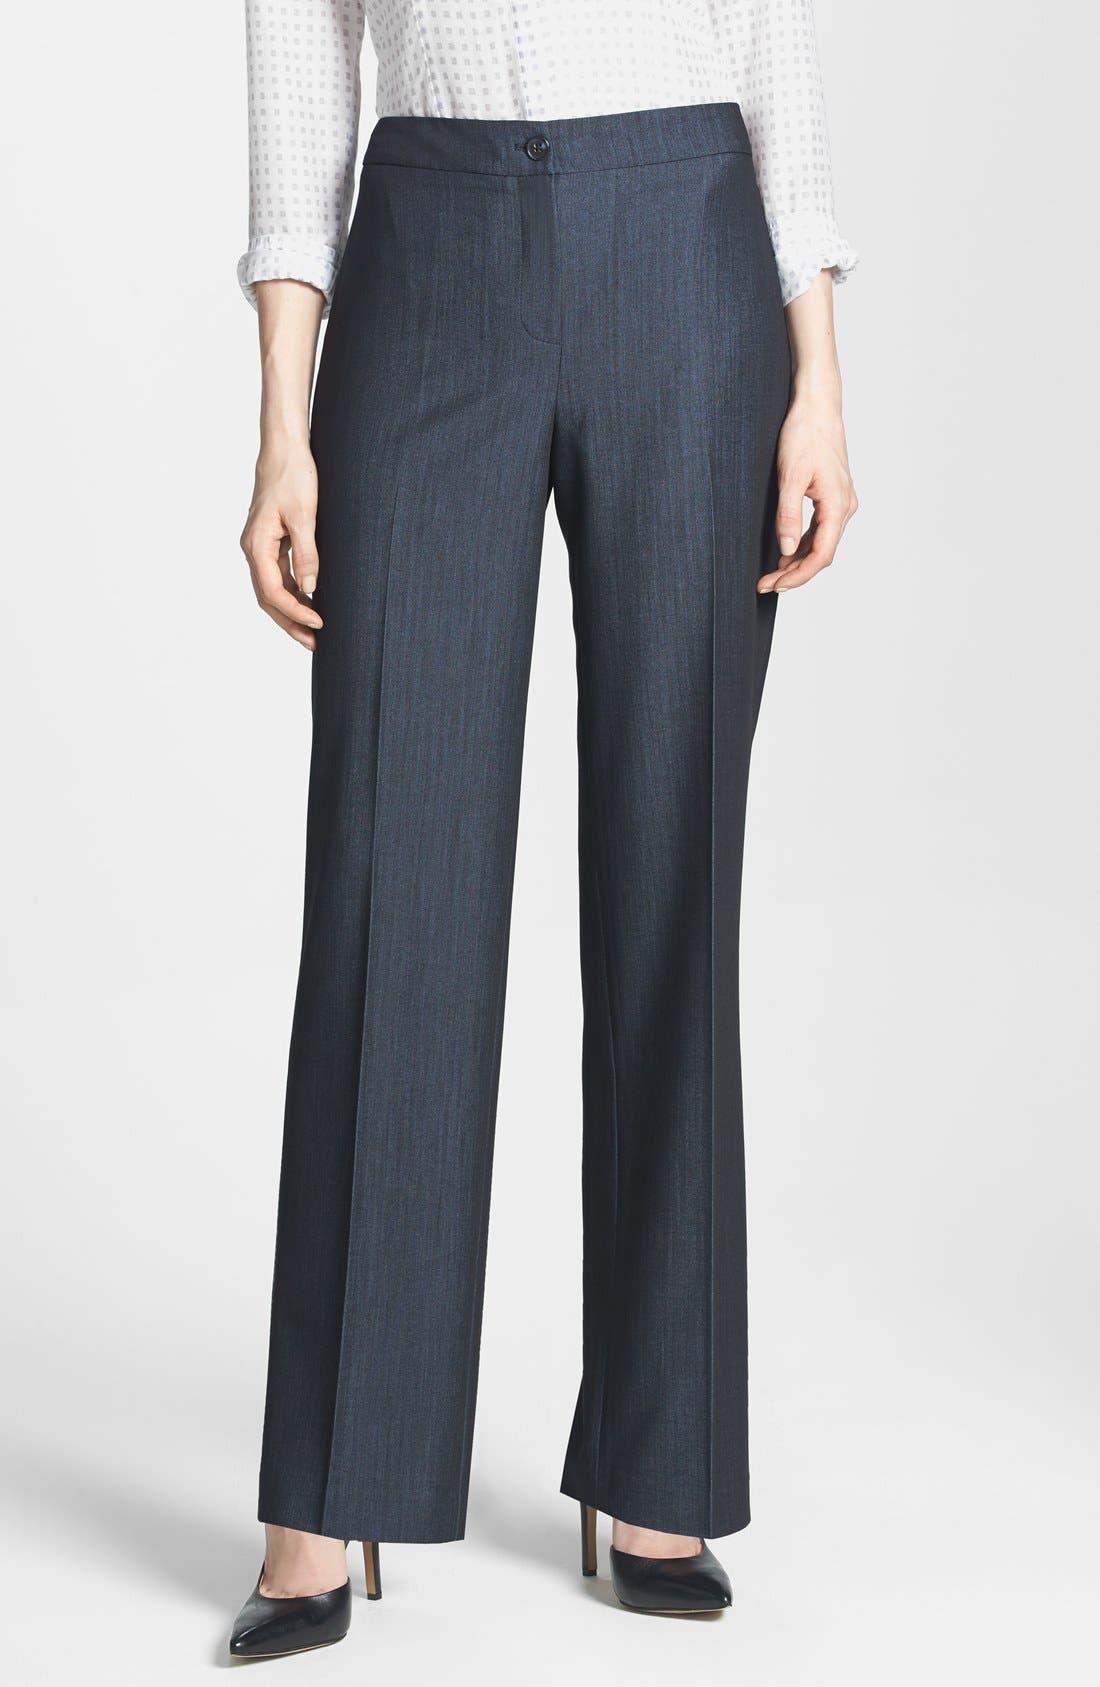 Alternate Image 1 Selected - Jones New York 'Sloane' Stretch Denim Mid Rise Pants (Regular & Petite)